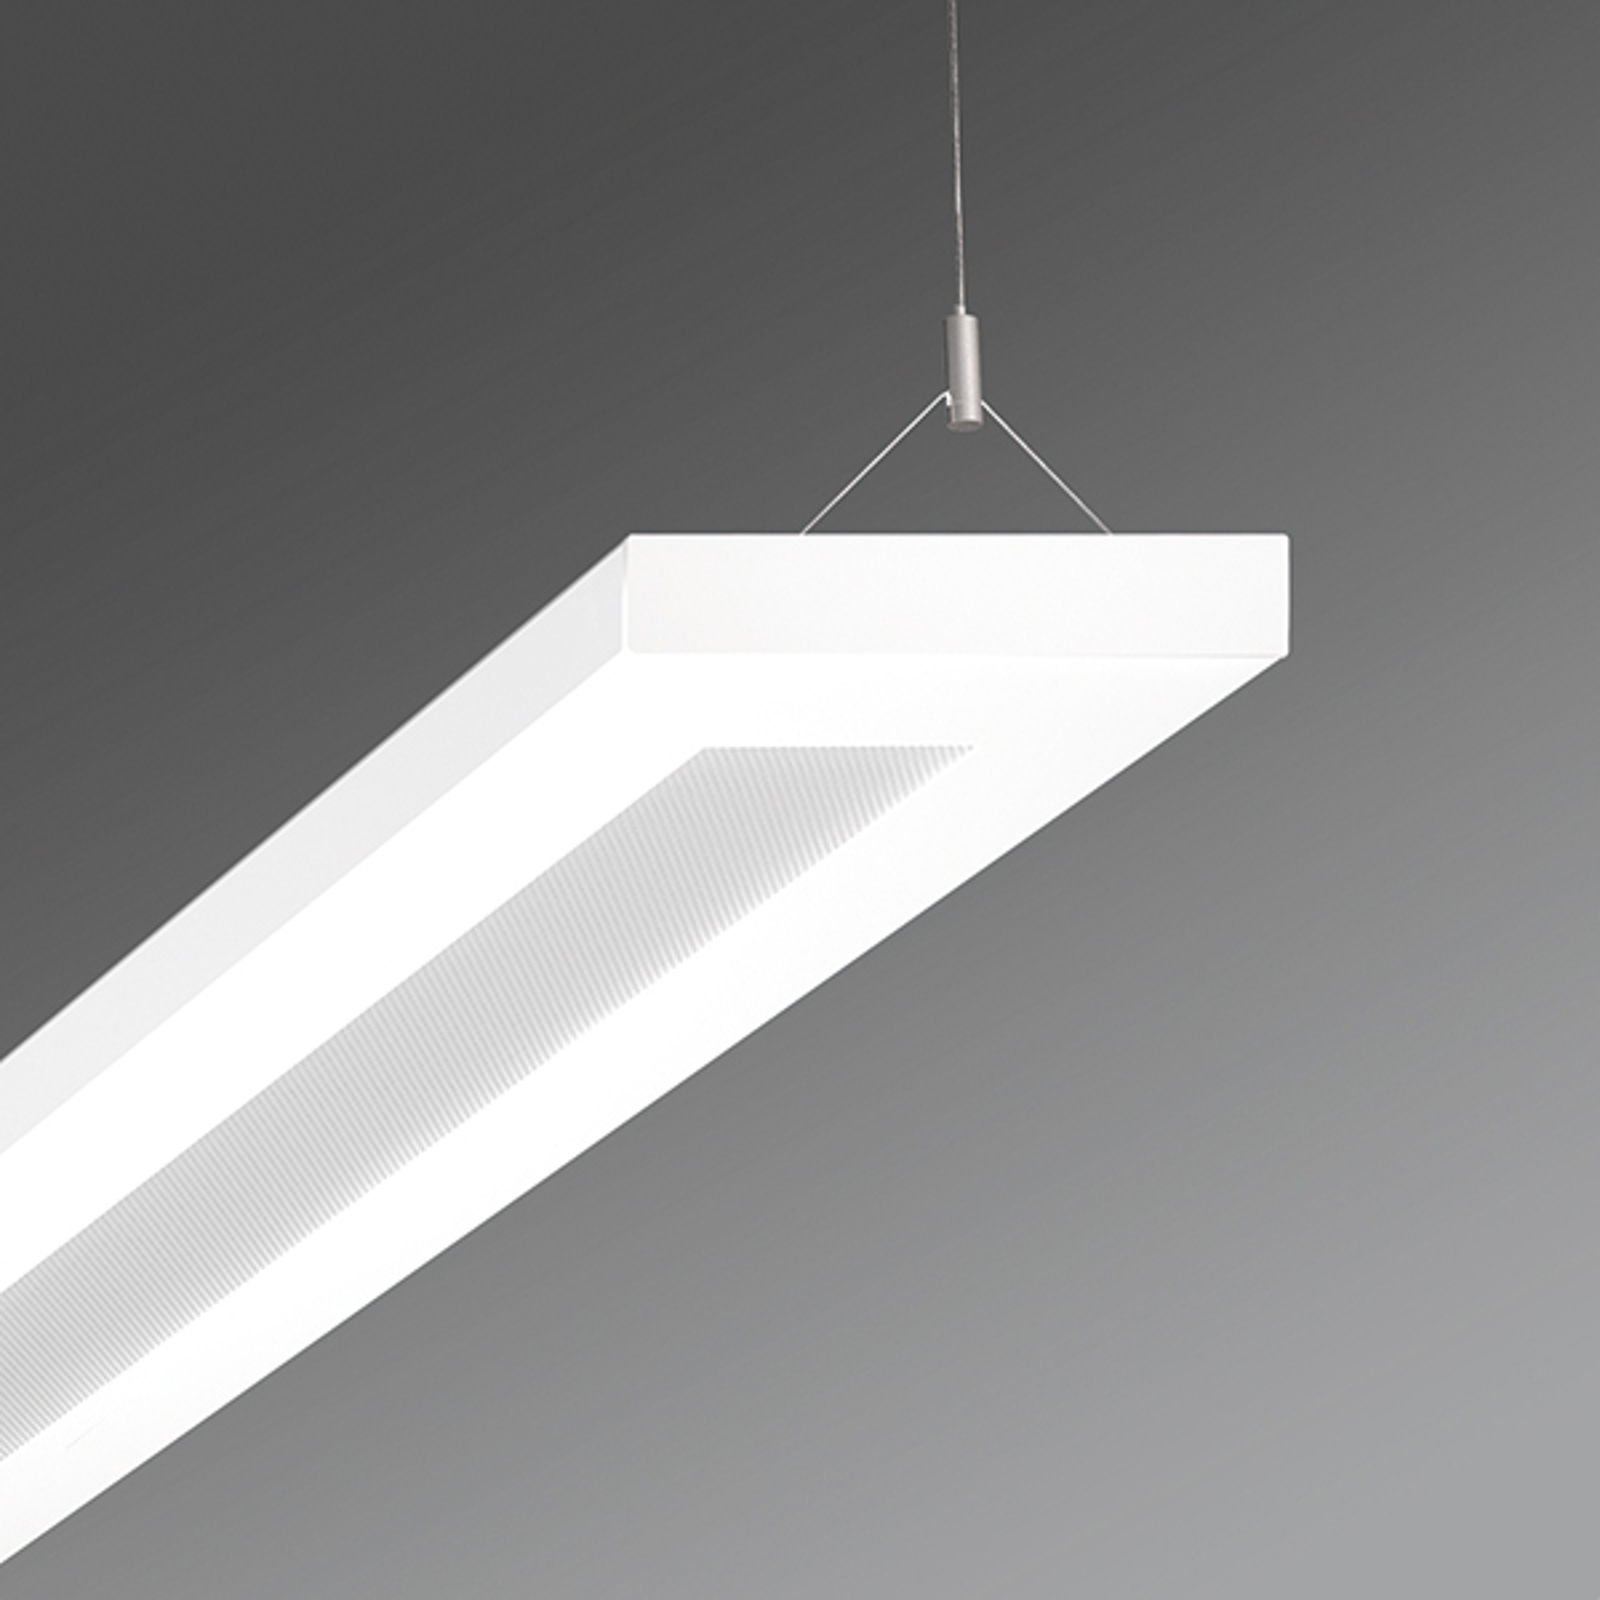 LED-Büro-Pendelleuchte Stail mikroprisma 32W weiß